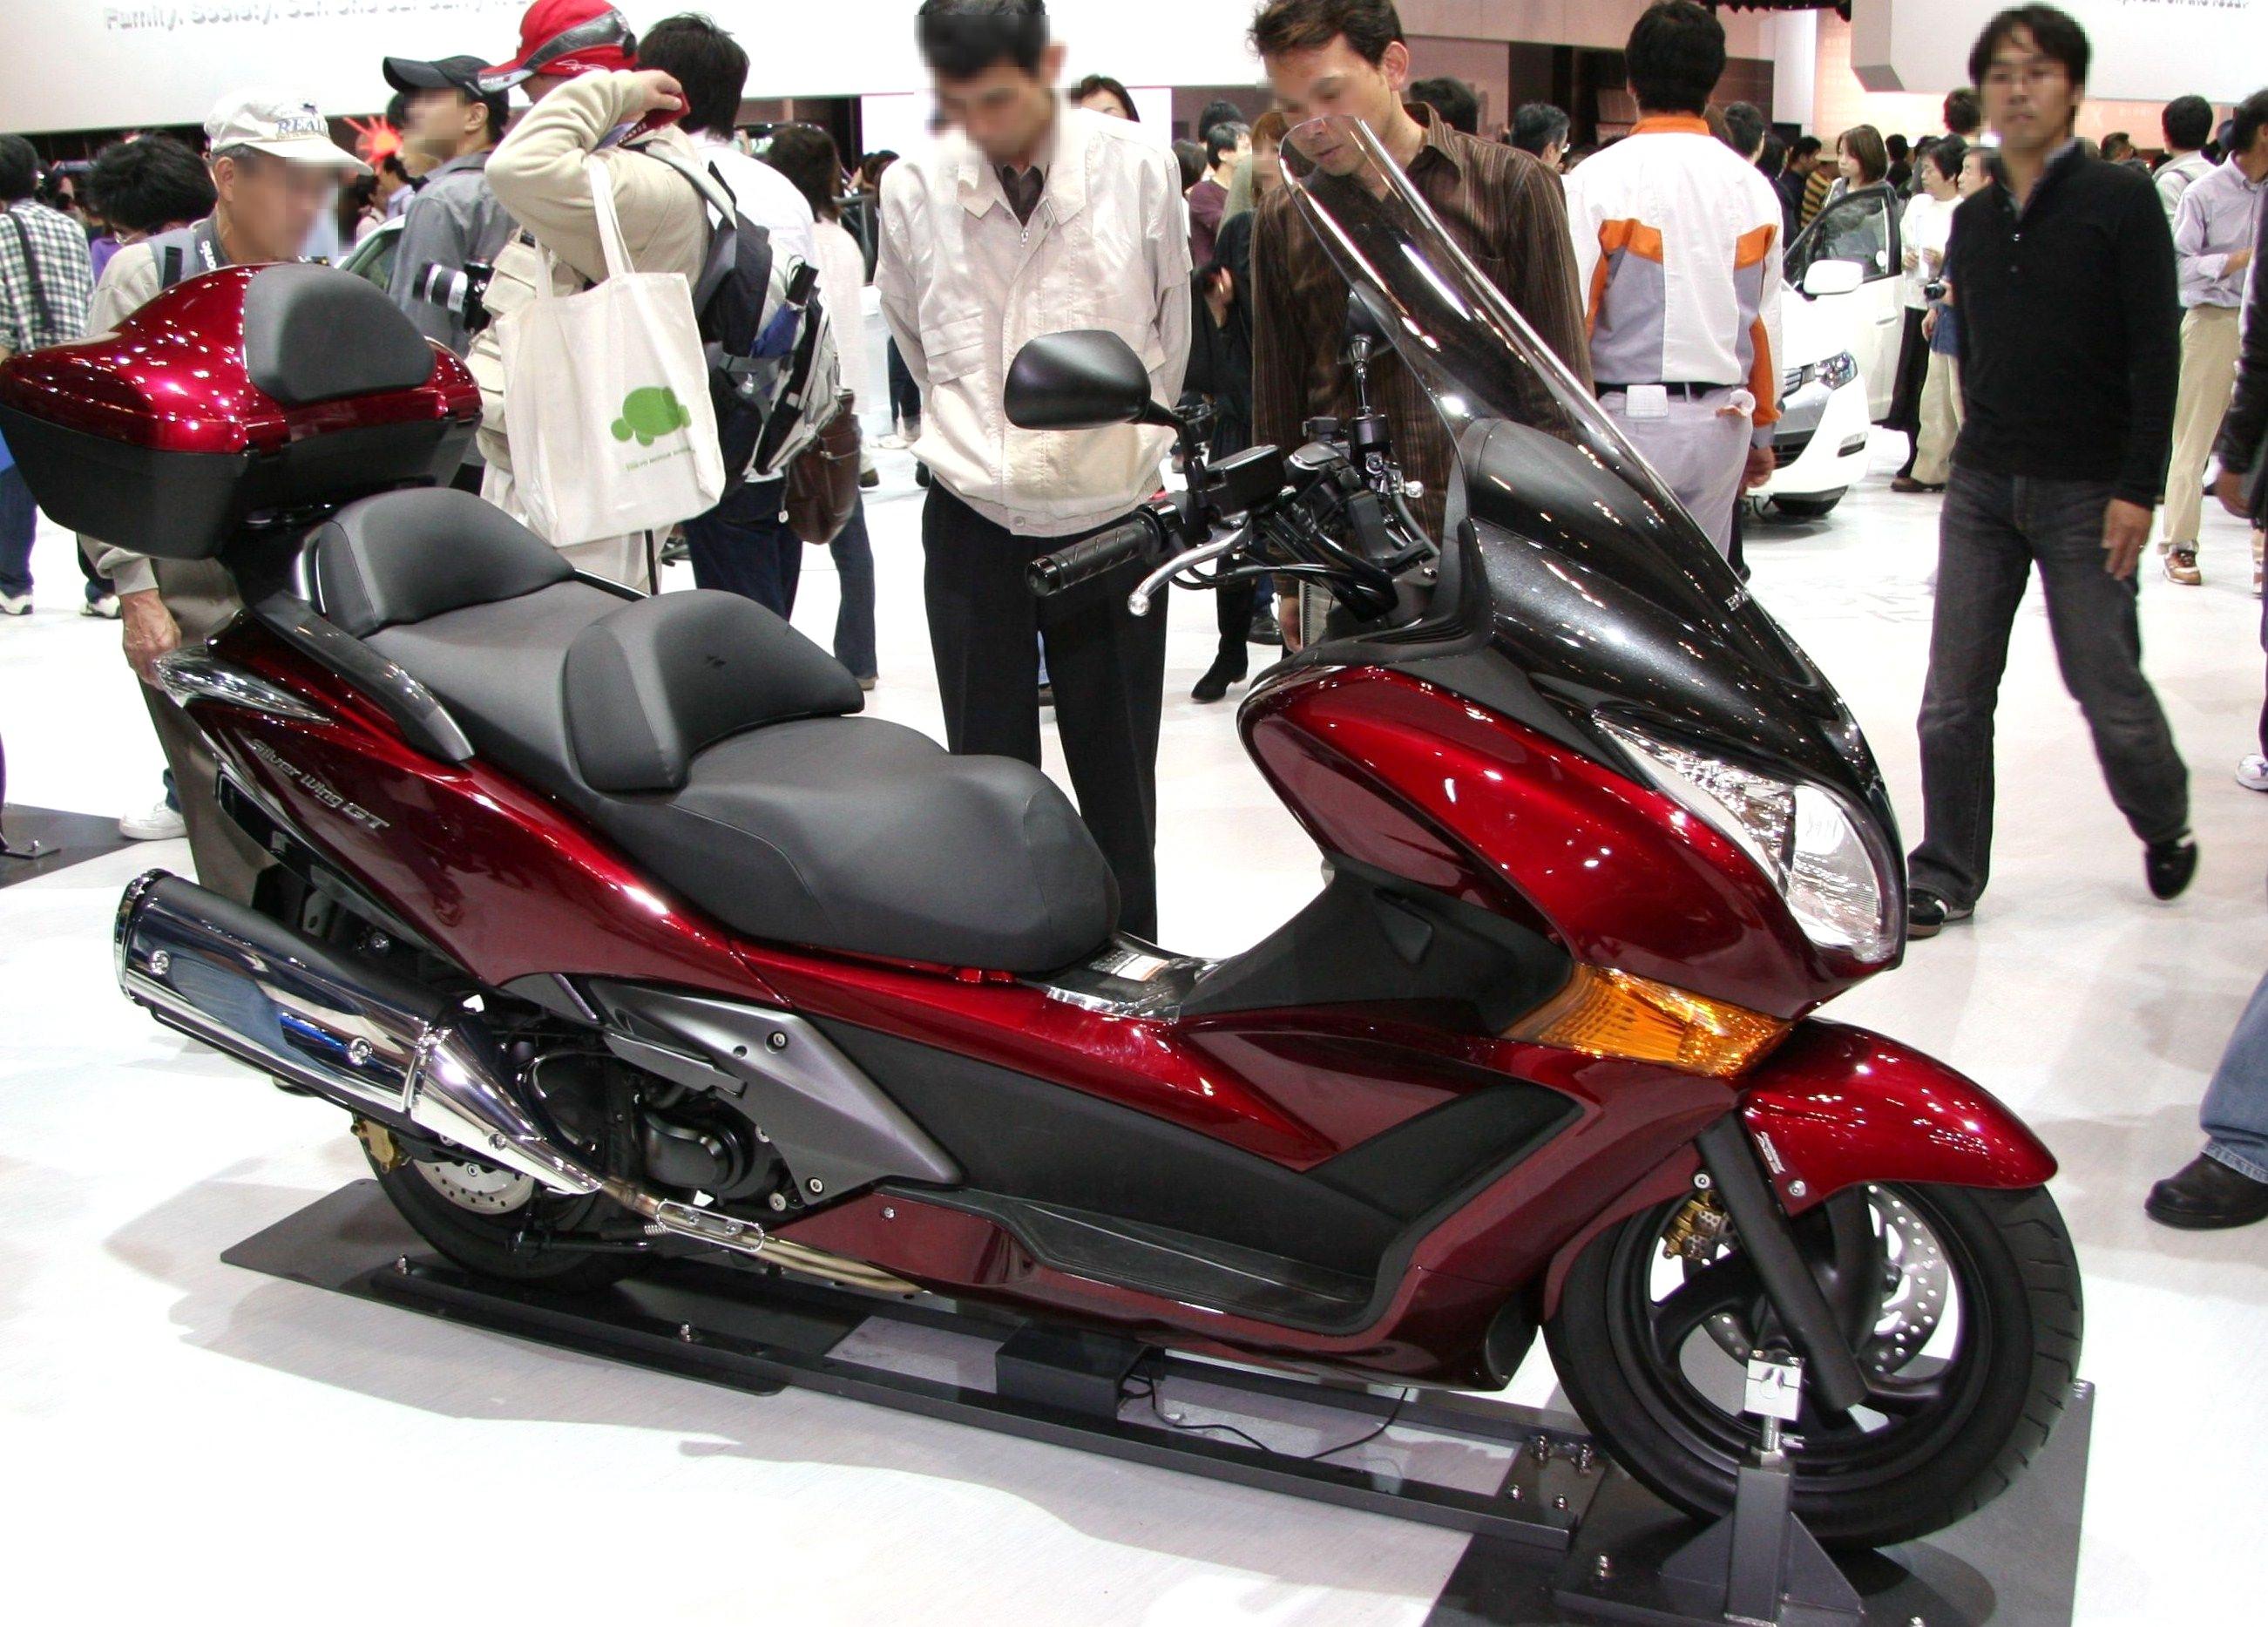 Honda Silverwing Vs Suzuki Burgman Reliability